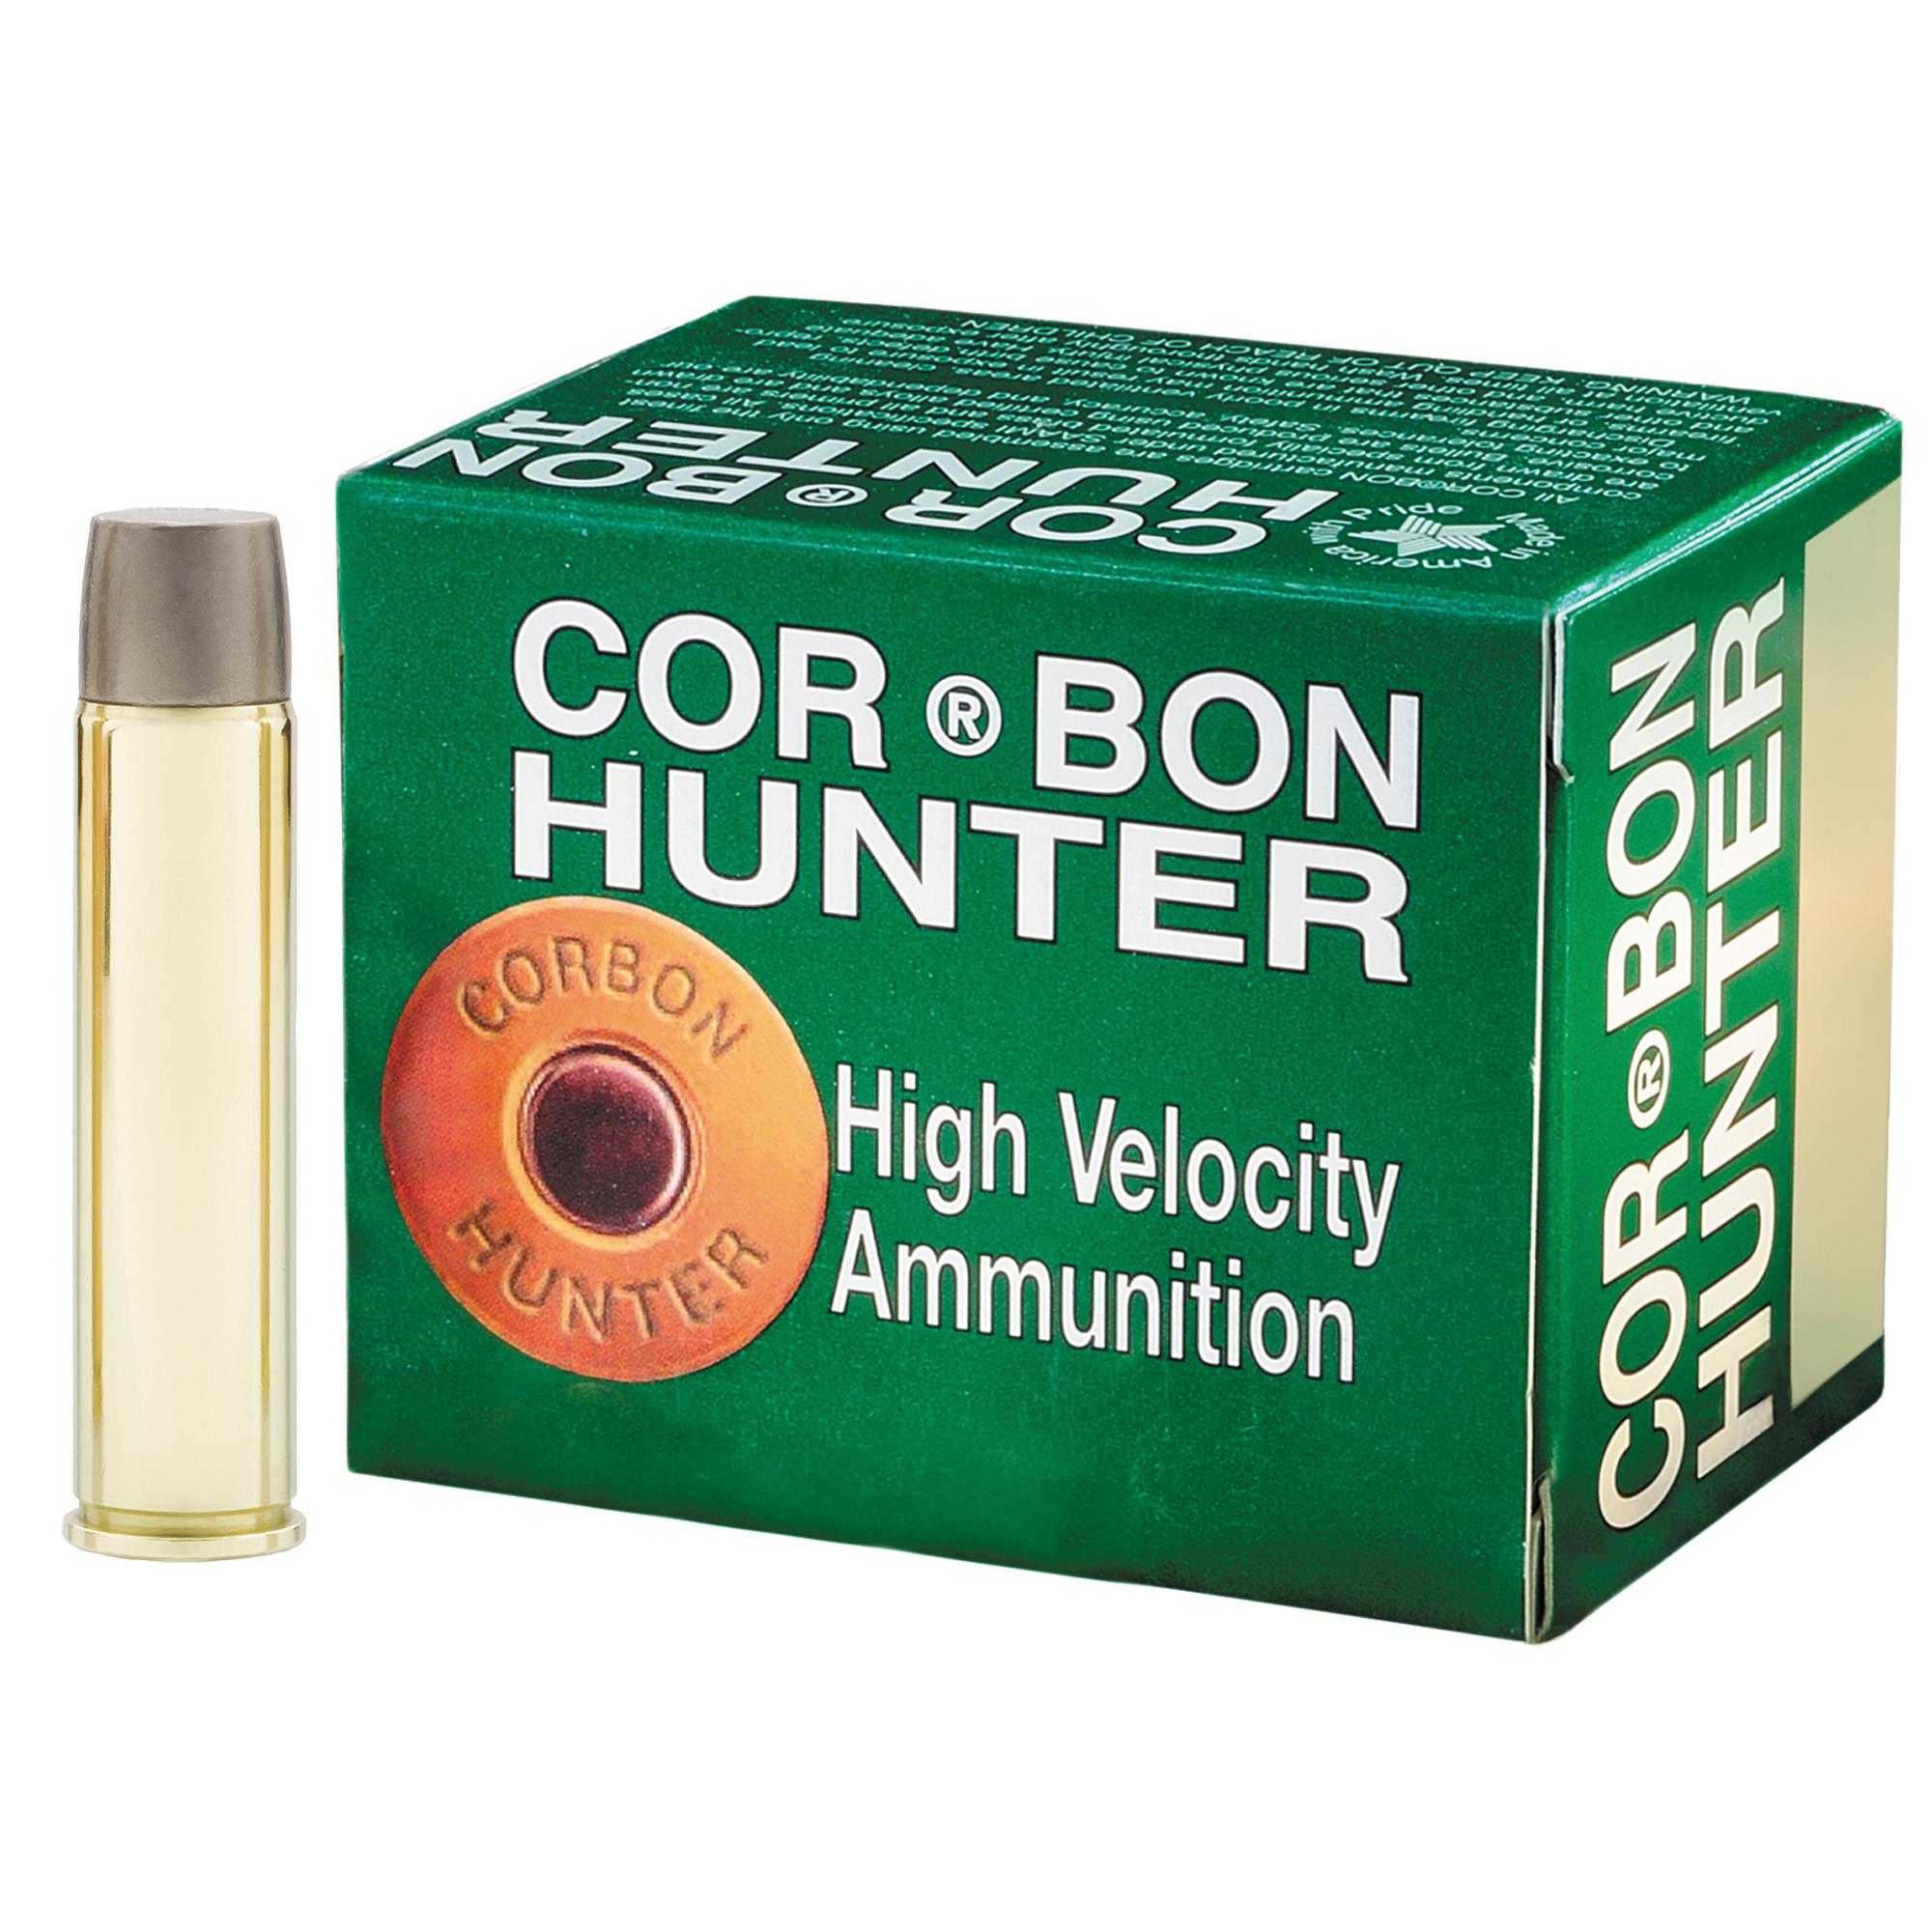 Corbon 460sw 395gr Hc  Hunt 20/500